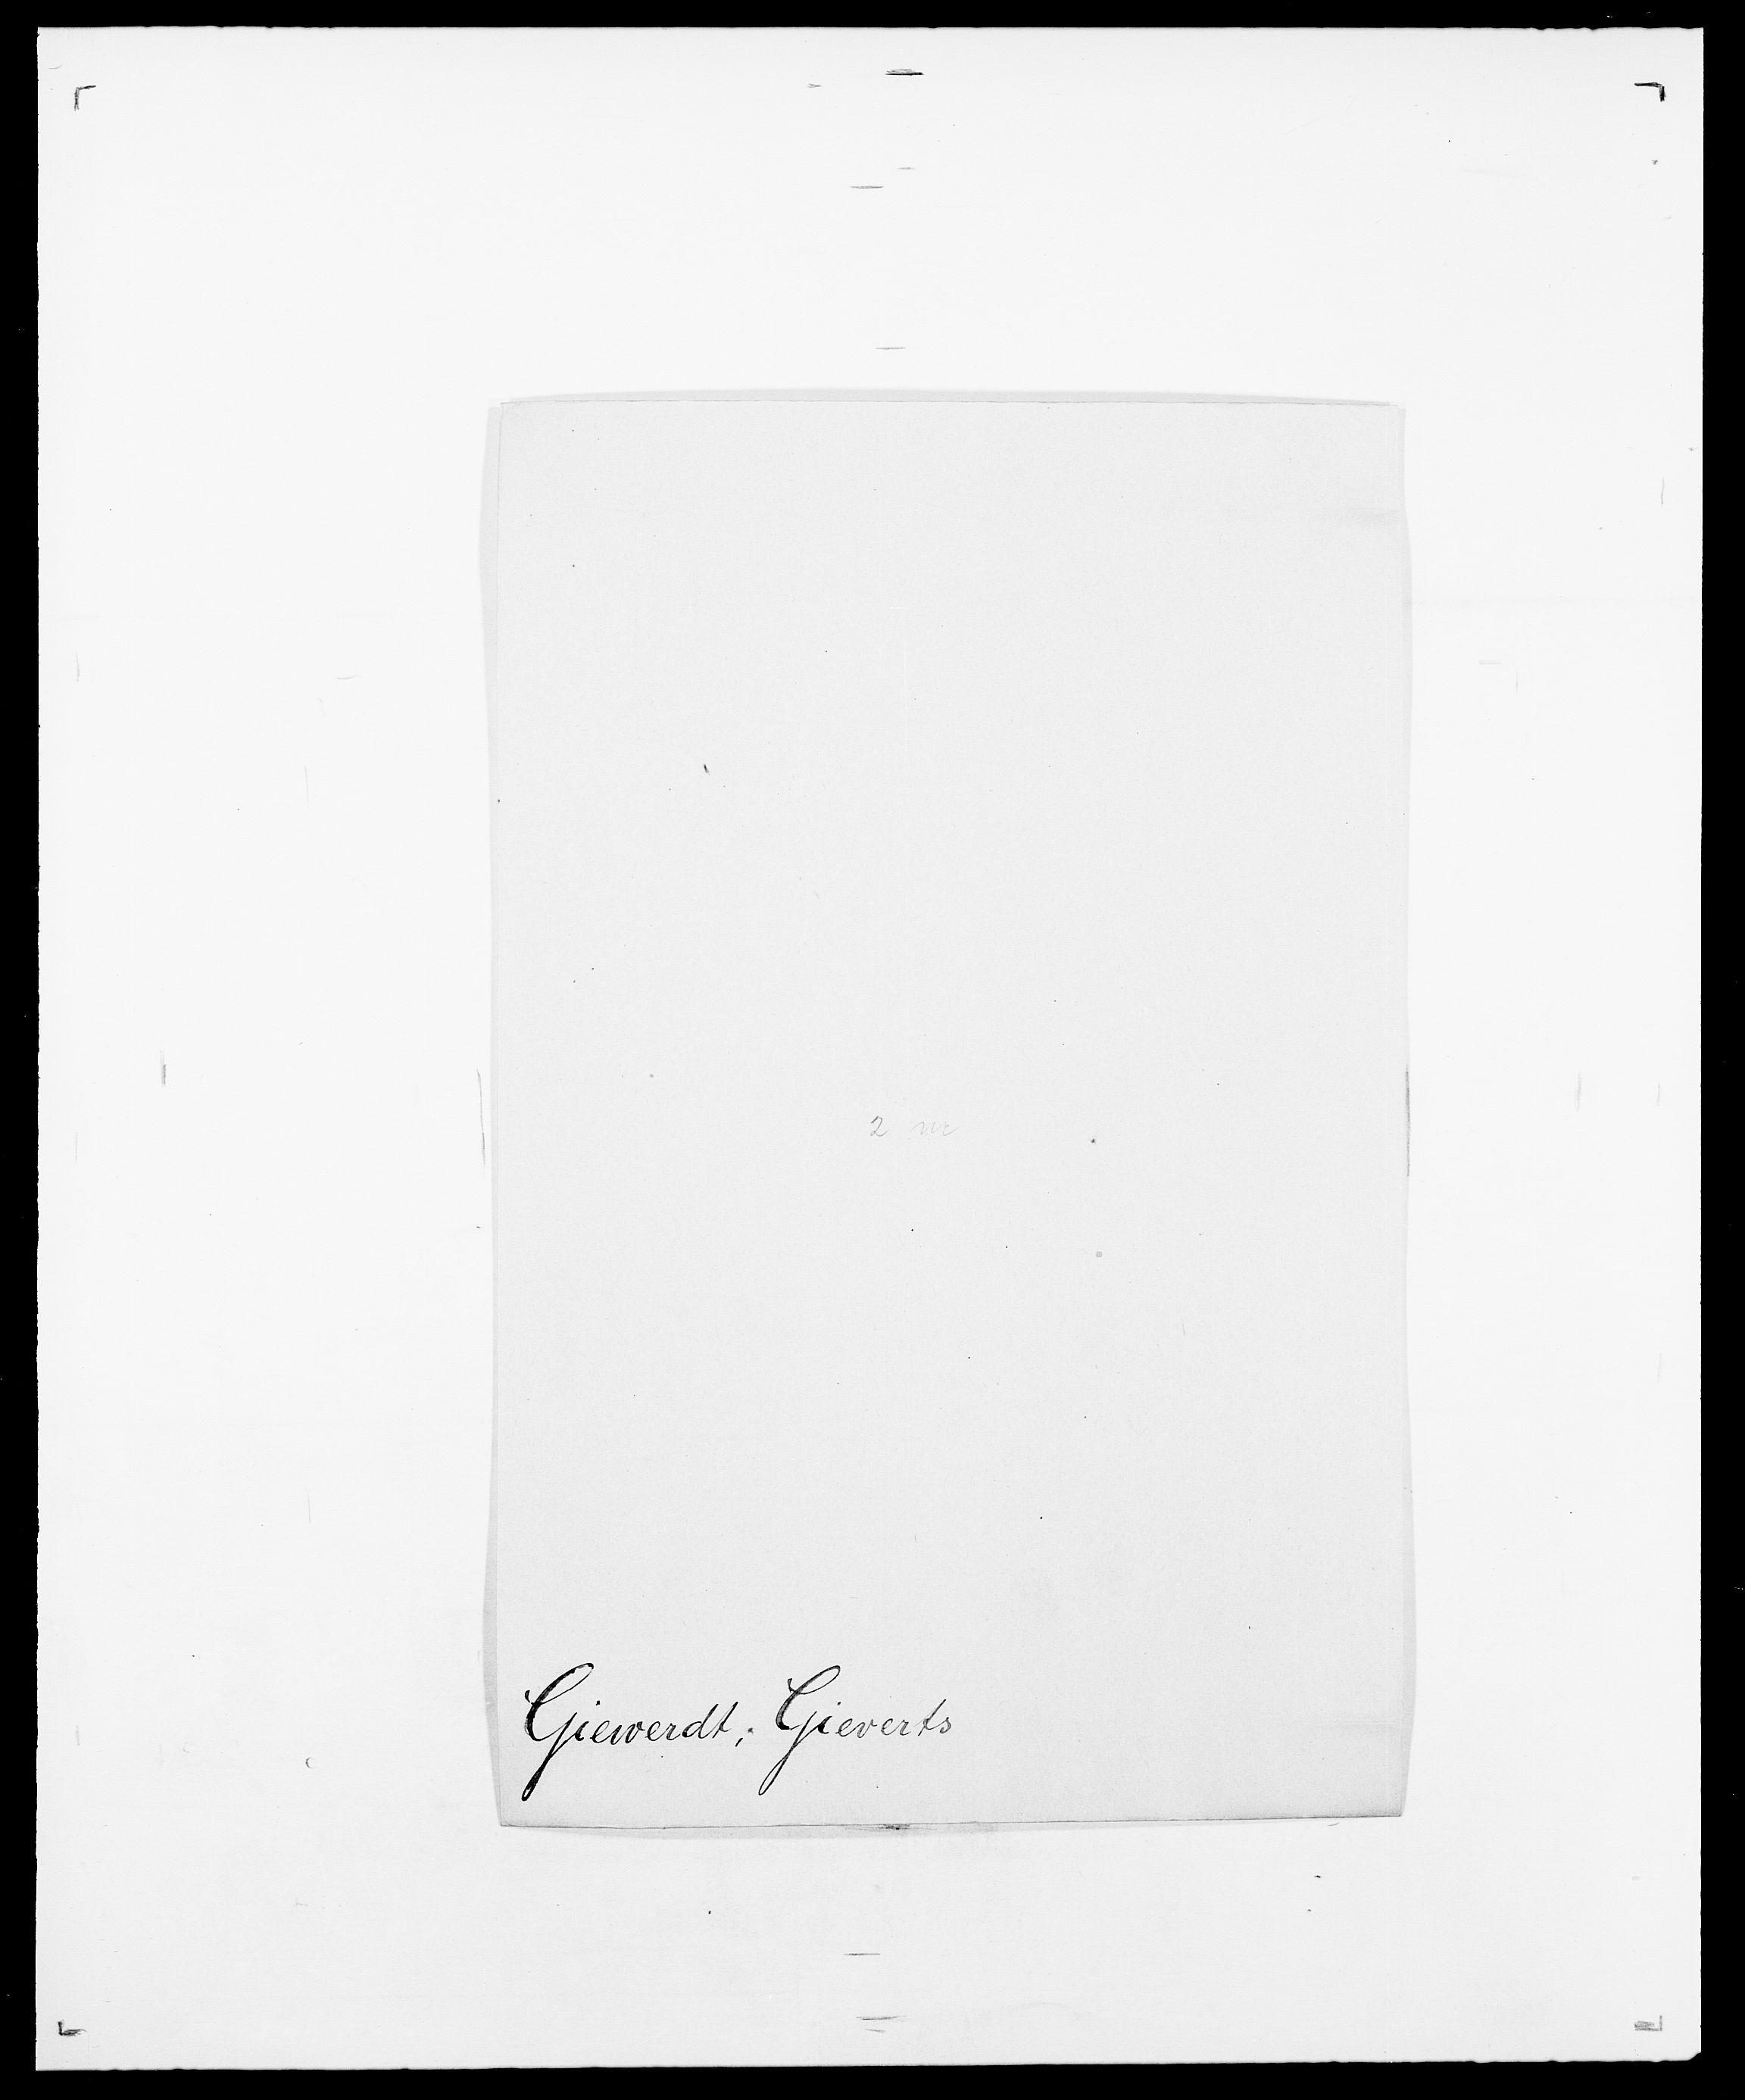 SAO, Delgobe, Charles Antoine - samling, D/Da/L0014: Giebdhausen - Grip, s. 21